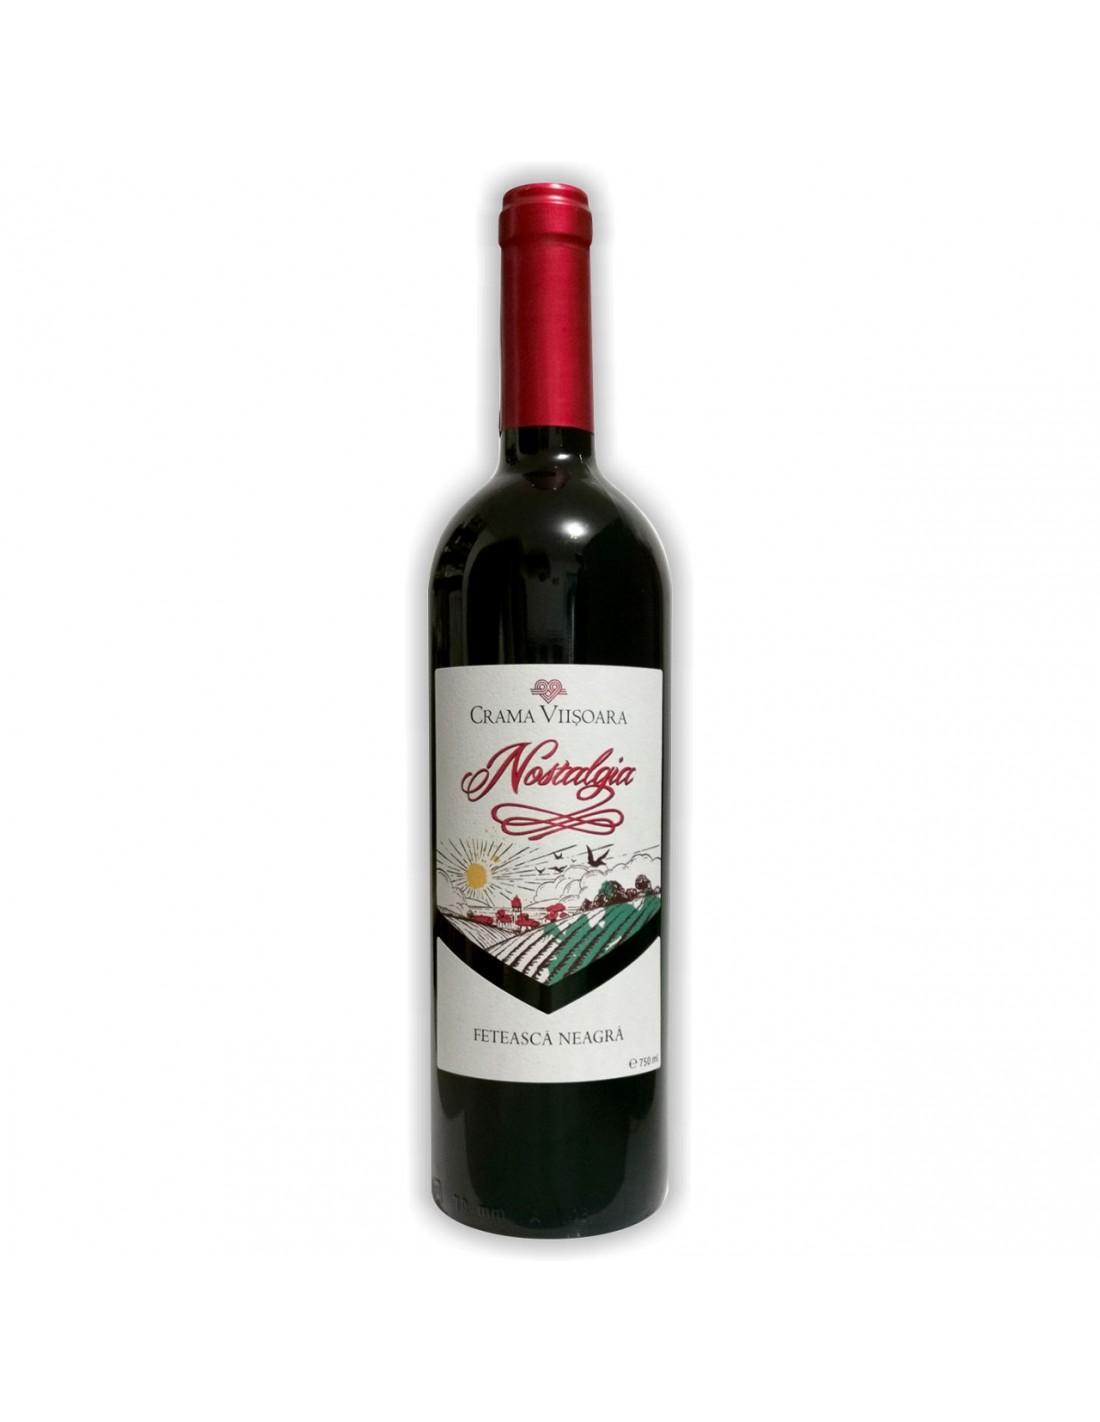 Vin rosu sec, Feteasca Neagra, Nostalgia, 0.75L, 14.5% alc., Romania